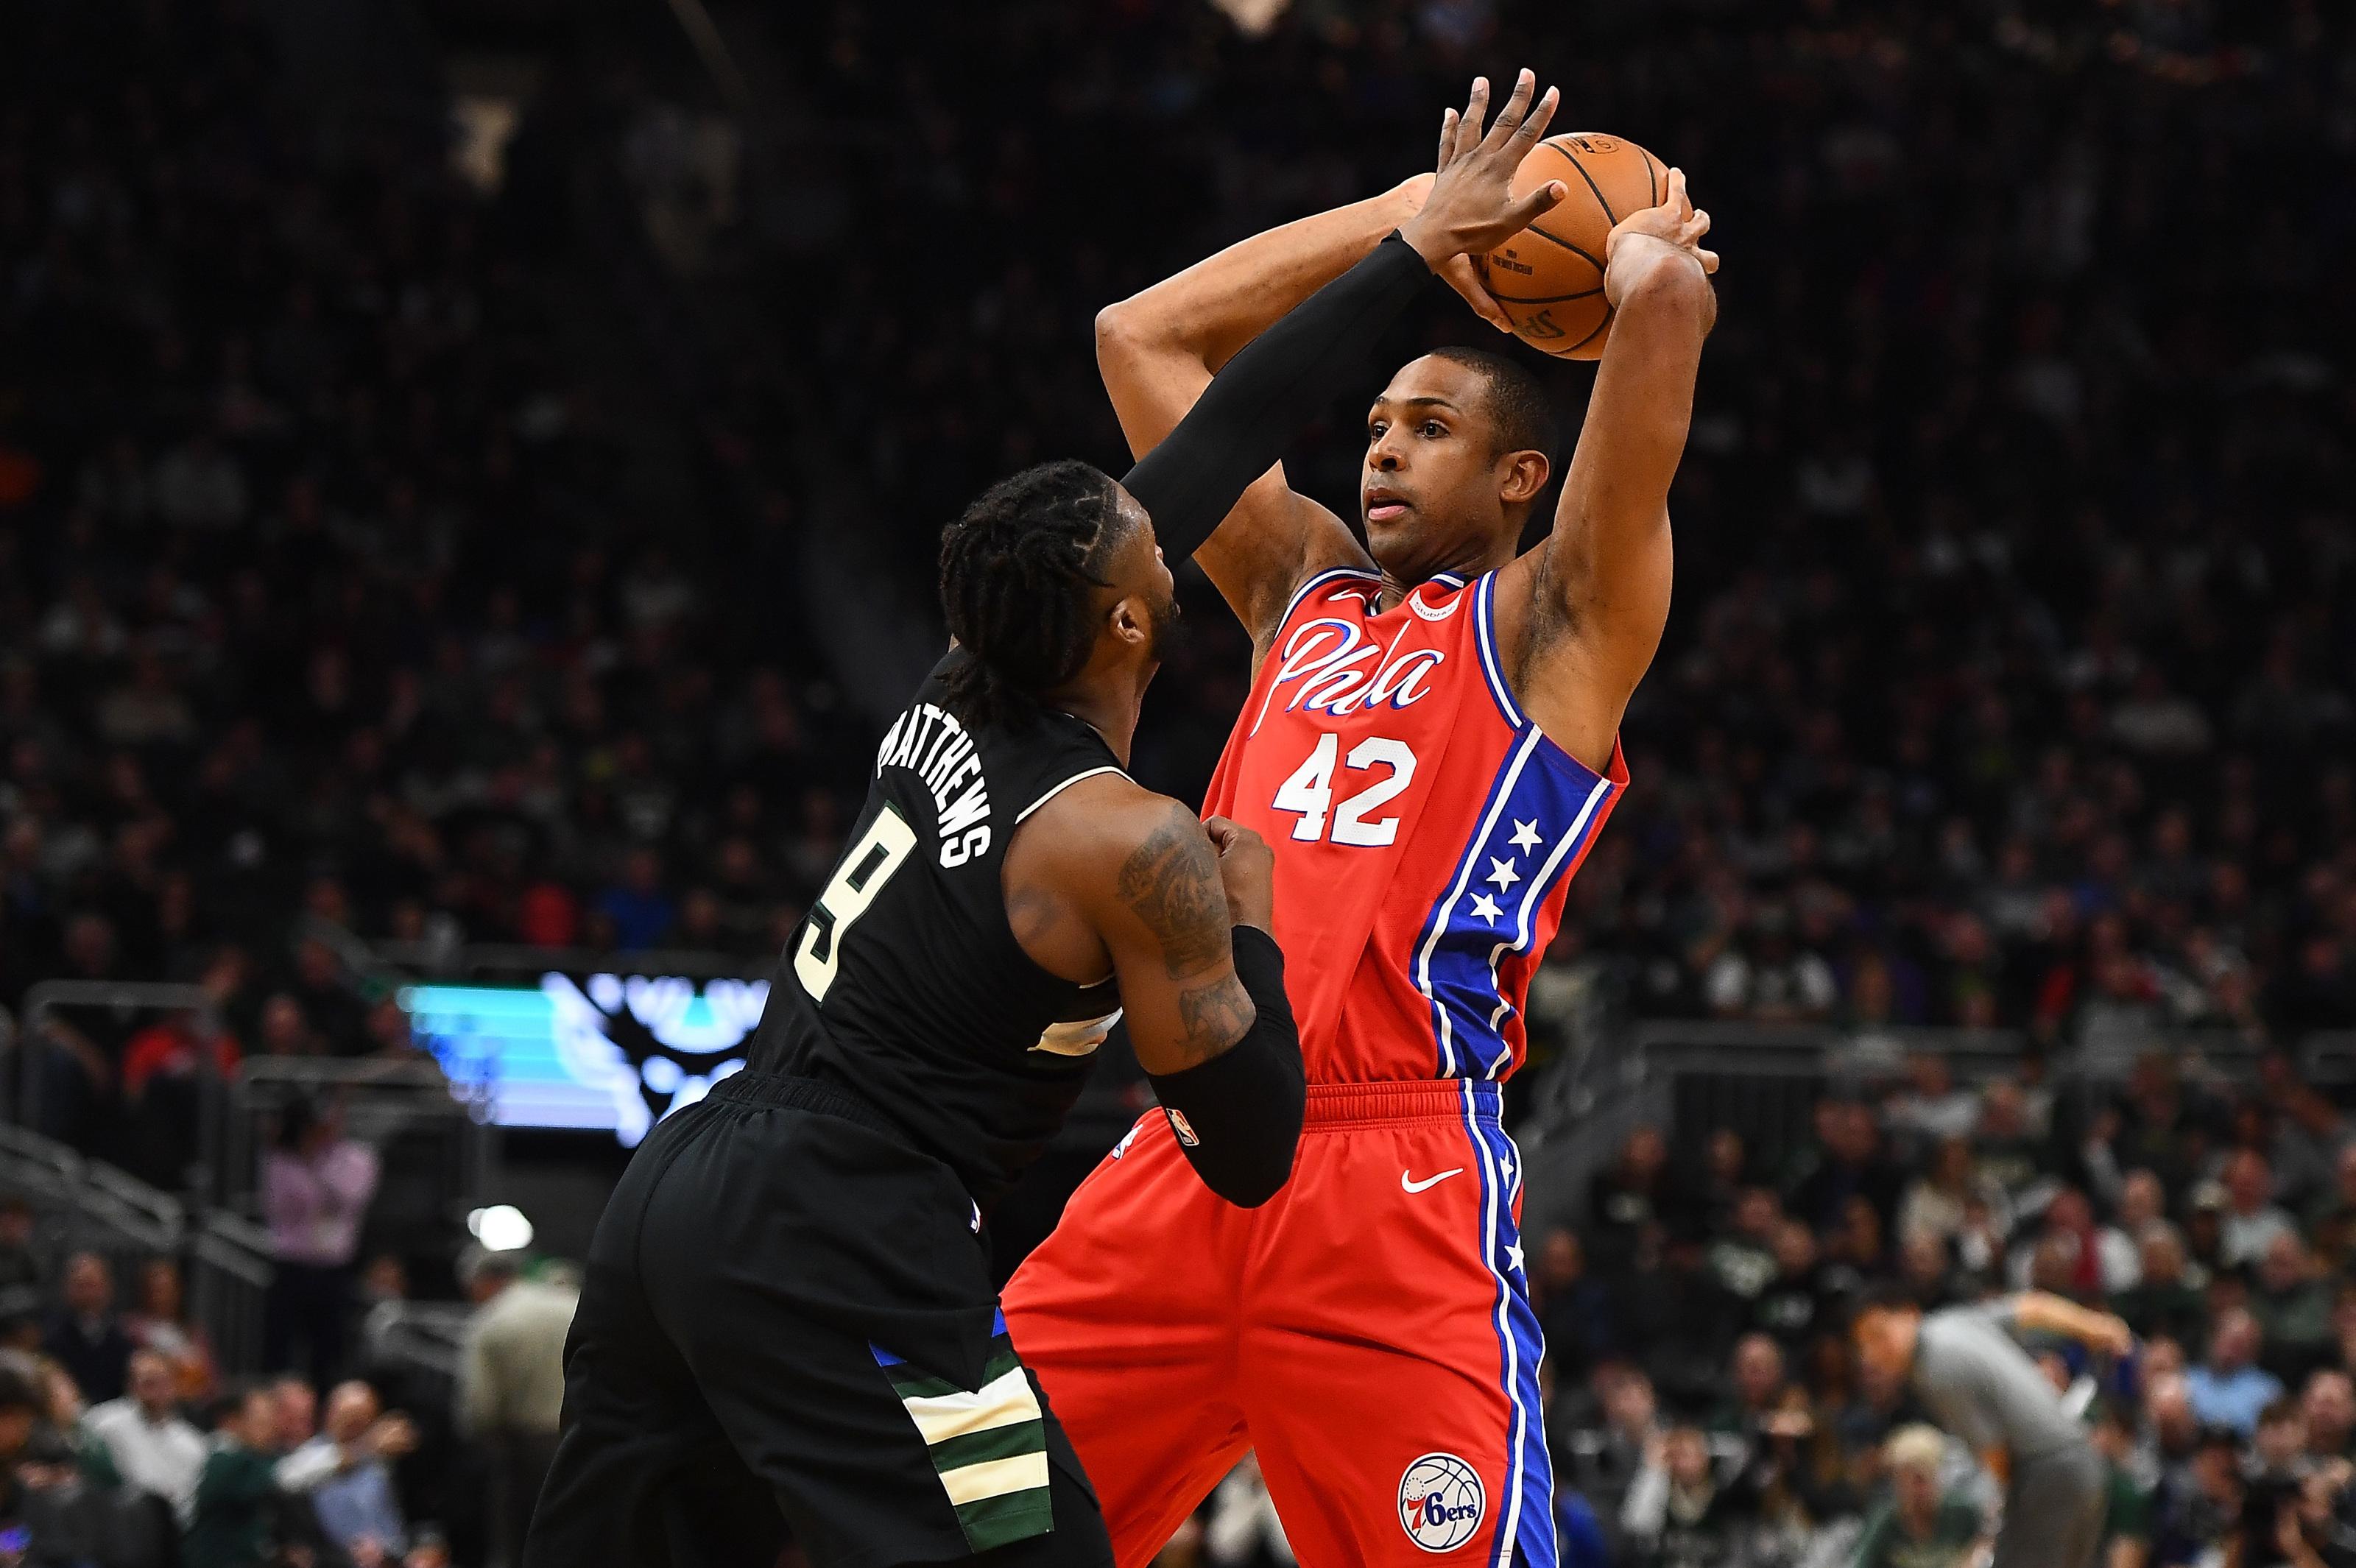 Philadelphia 76ers: Al Horford has reached rock bottom